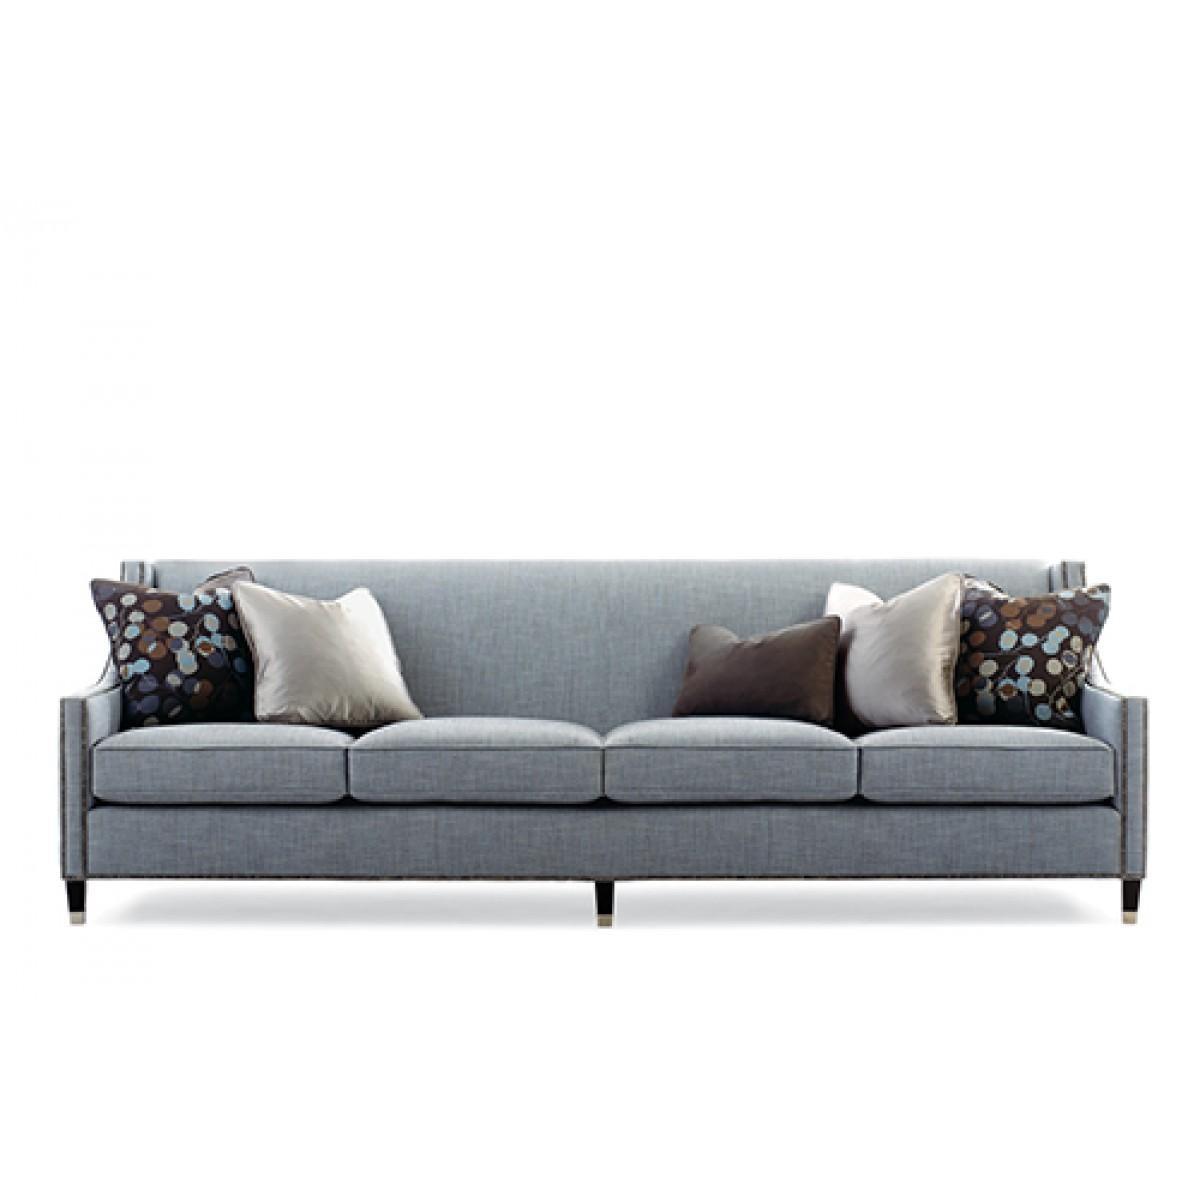 Bernhardt Tarleton Sofa With Ideas Picture 25438 | Kengire Intended For Bernhardt Tarleton Sofas (View 8 of 20)